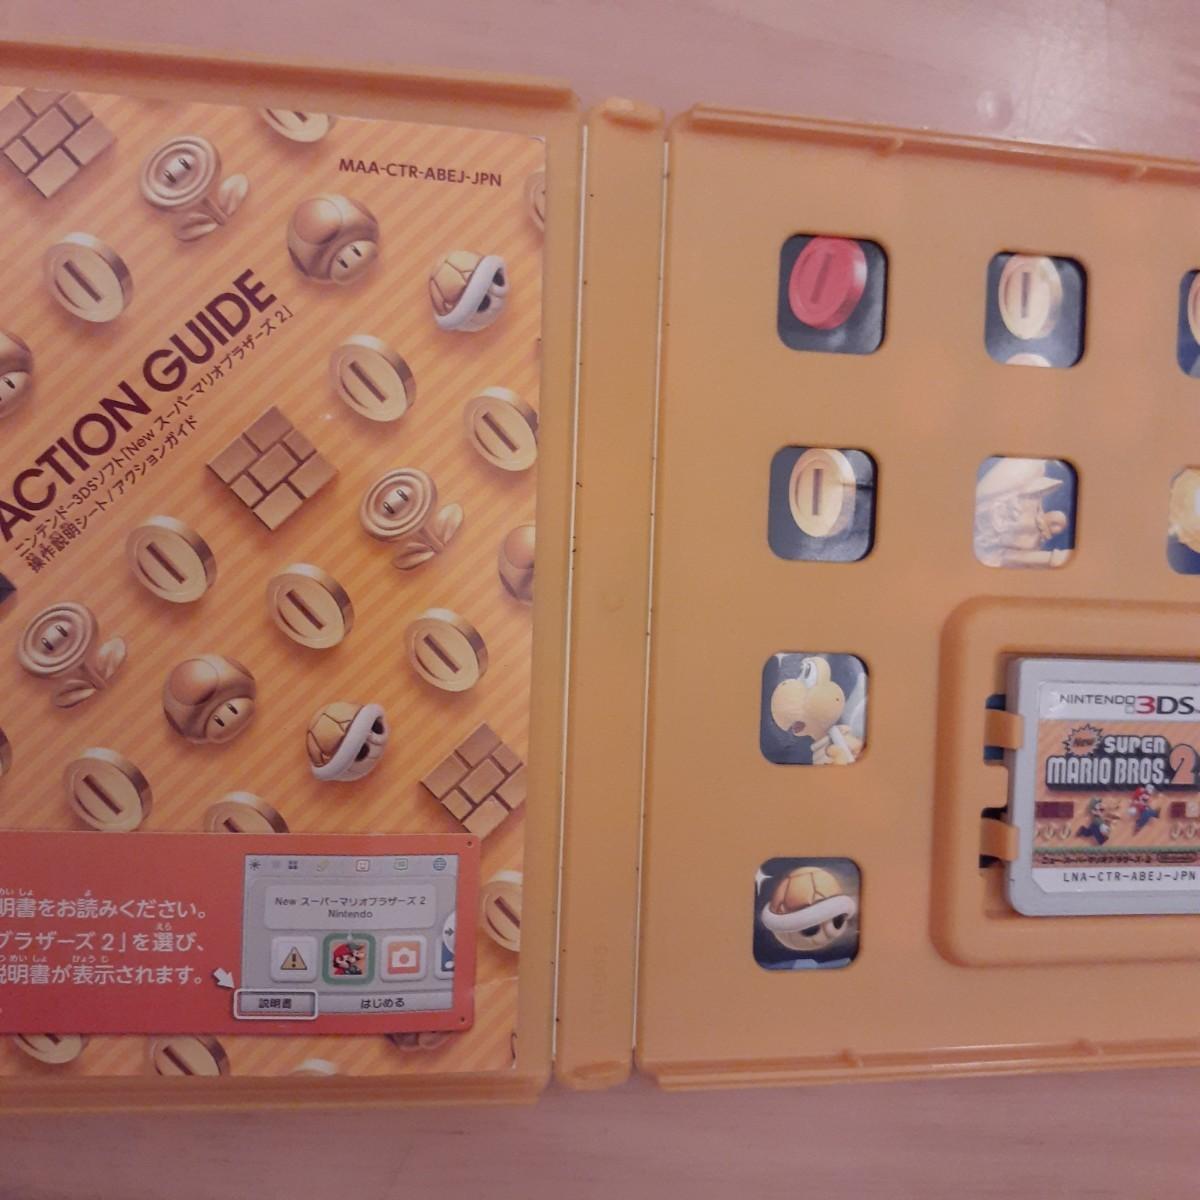 Newスーパーマリオブラザーズ2 3DSソフト 任天堂